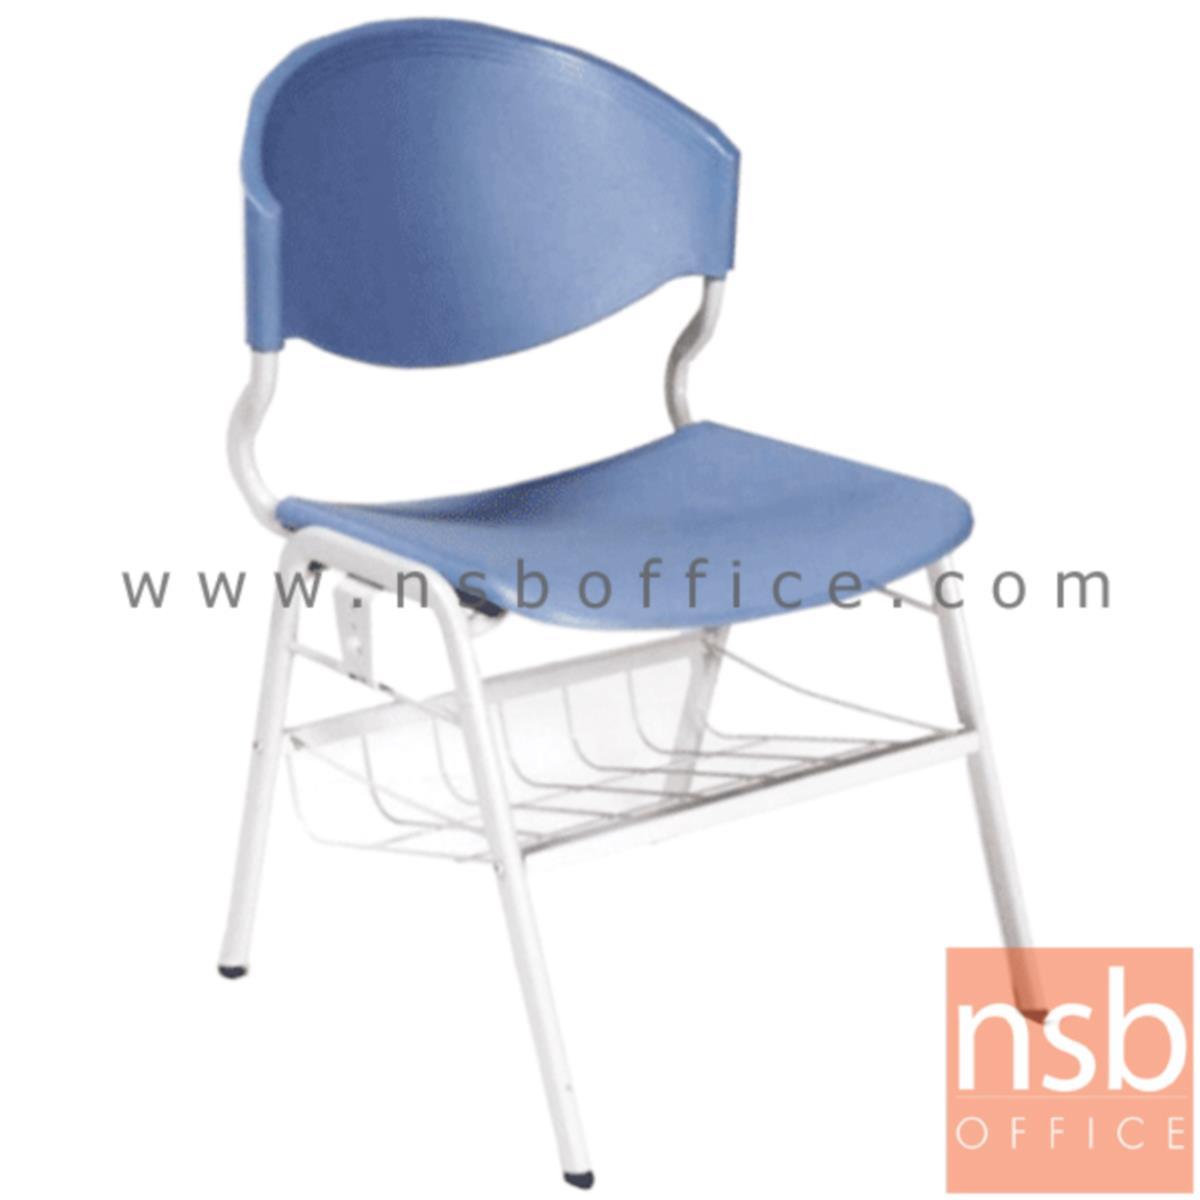 B05A034:เก้าอี้อเนกประสงค์เฟรมโพลี่ รุ่น TD-780  มีตะแกรงล่าง มีที่เกี่ยวด้านข้าง ขาเหล็ก